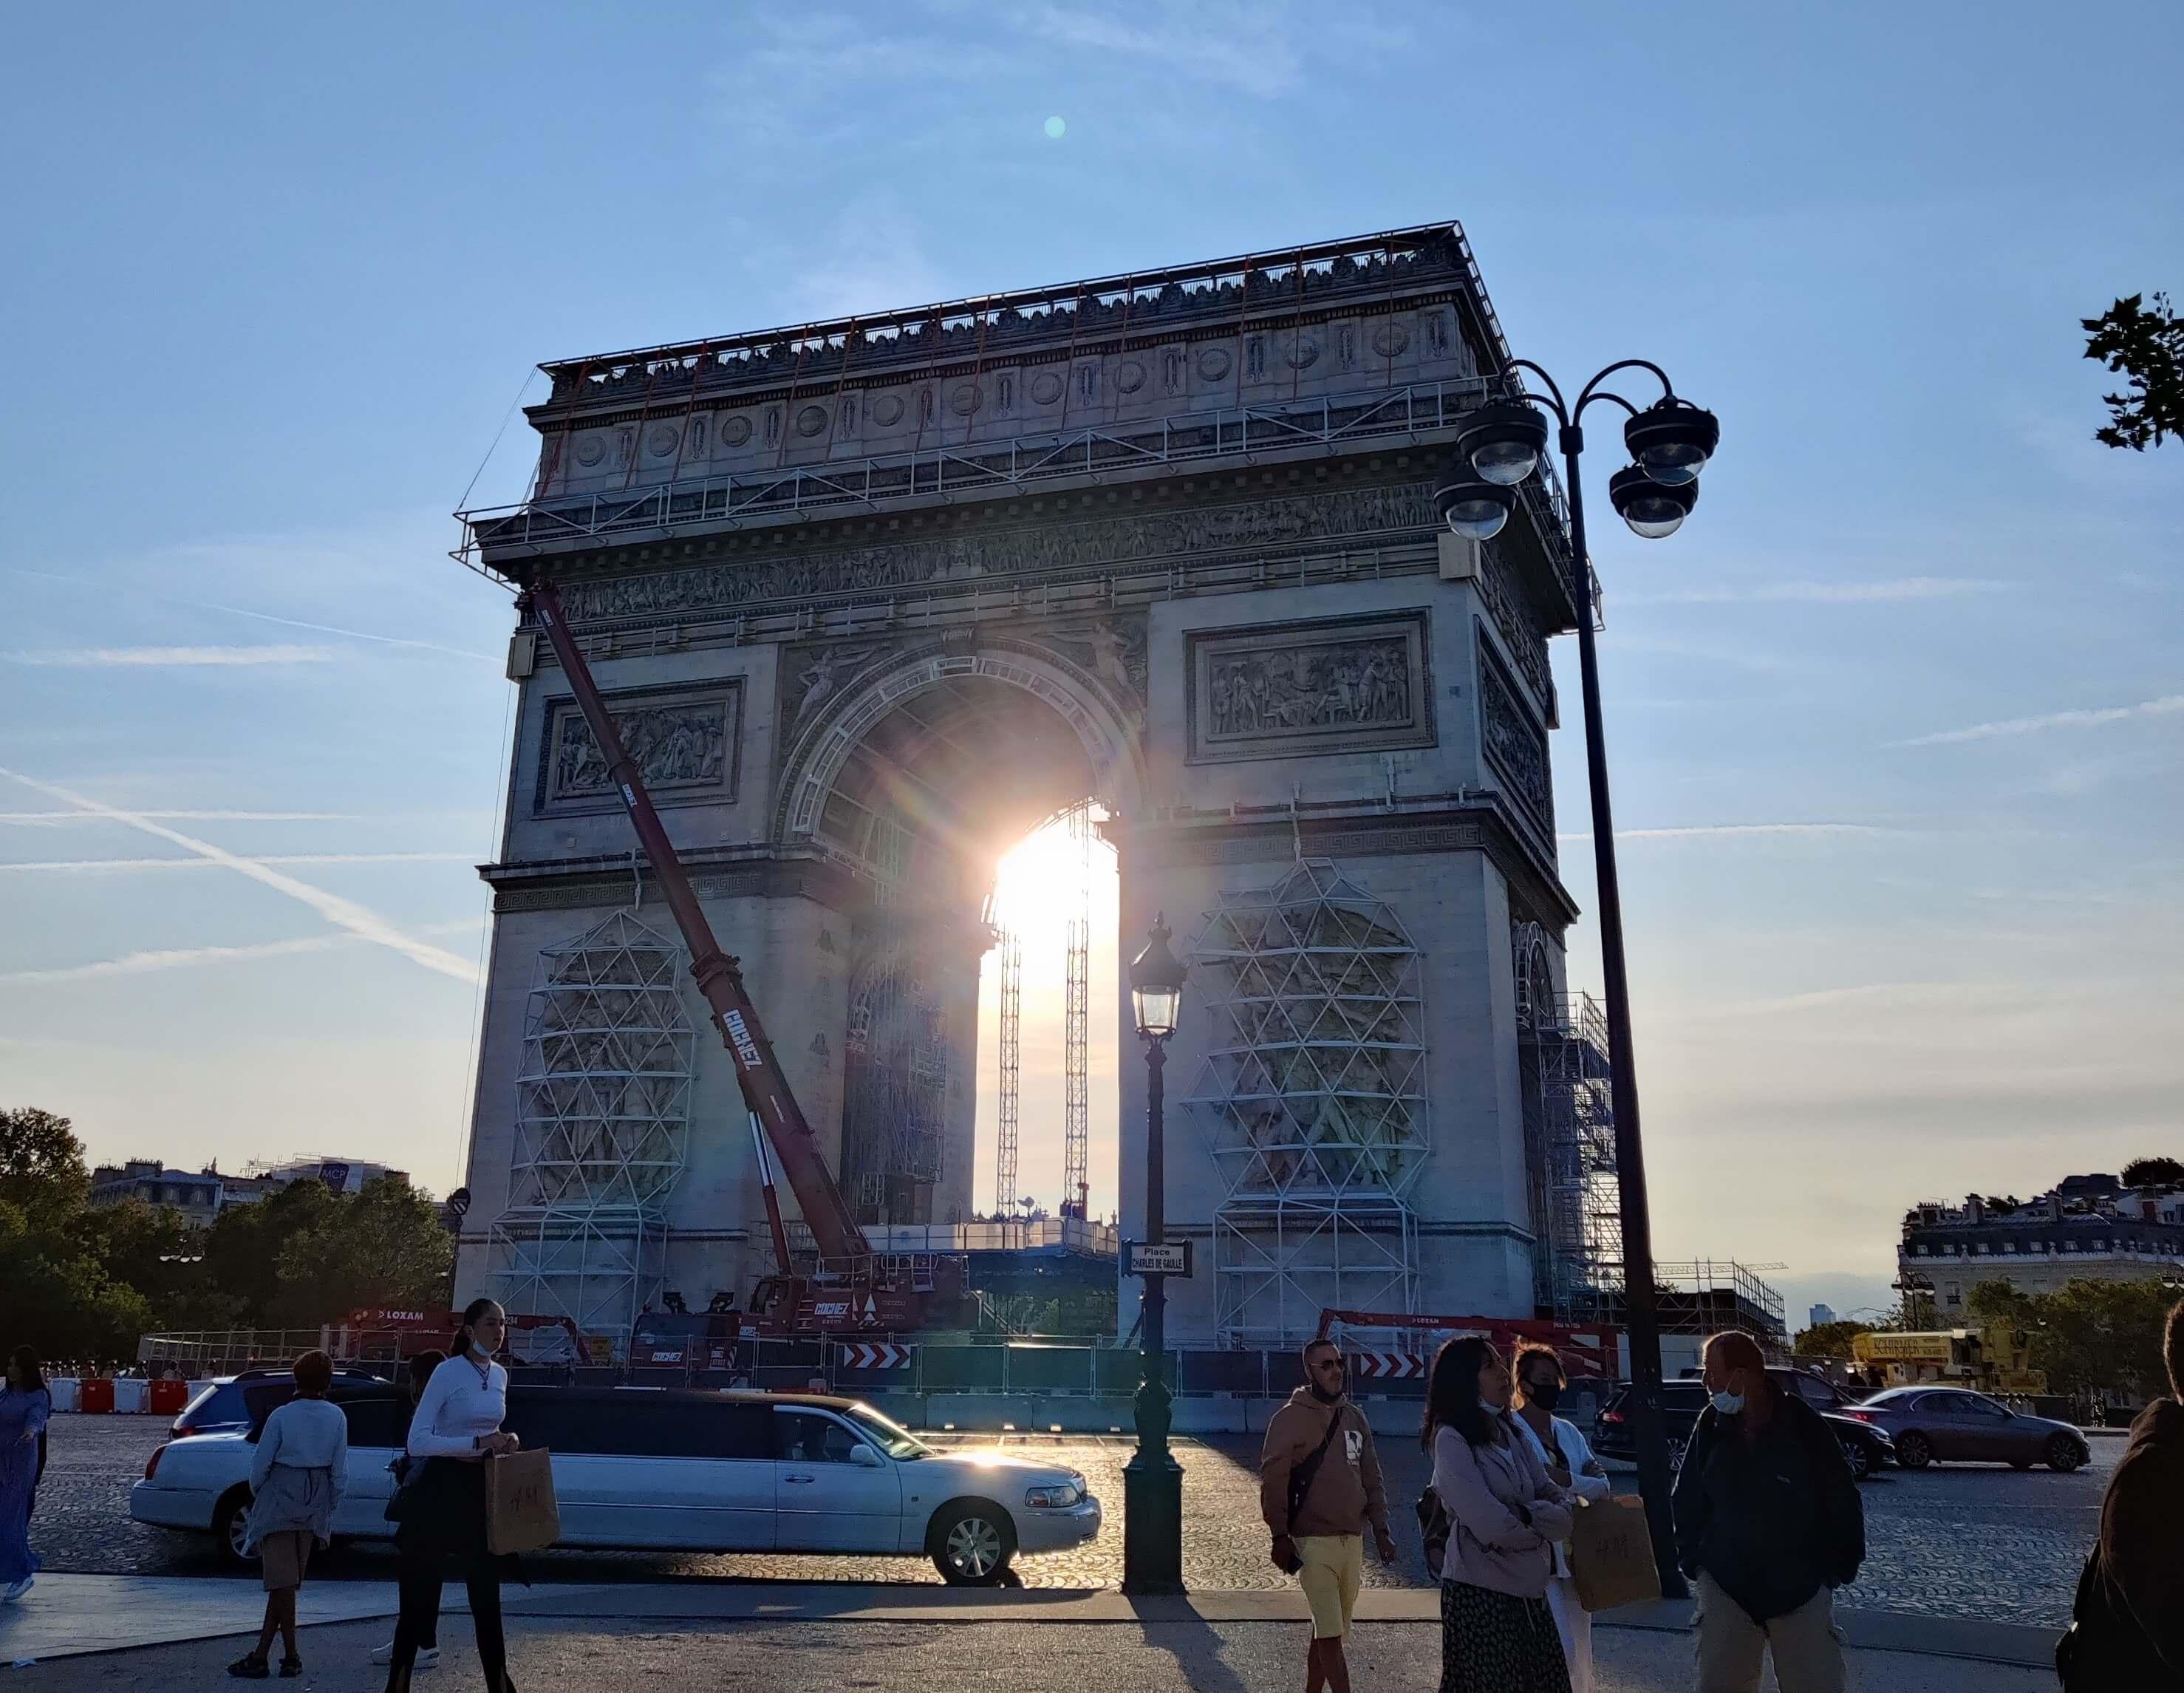 Arc de Triomphe - Future of Commuting